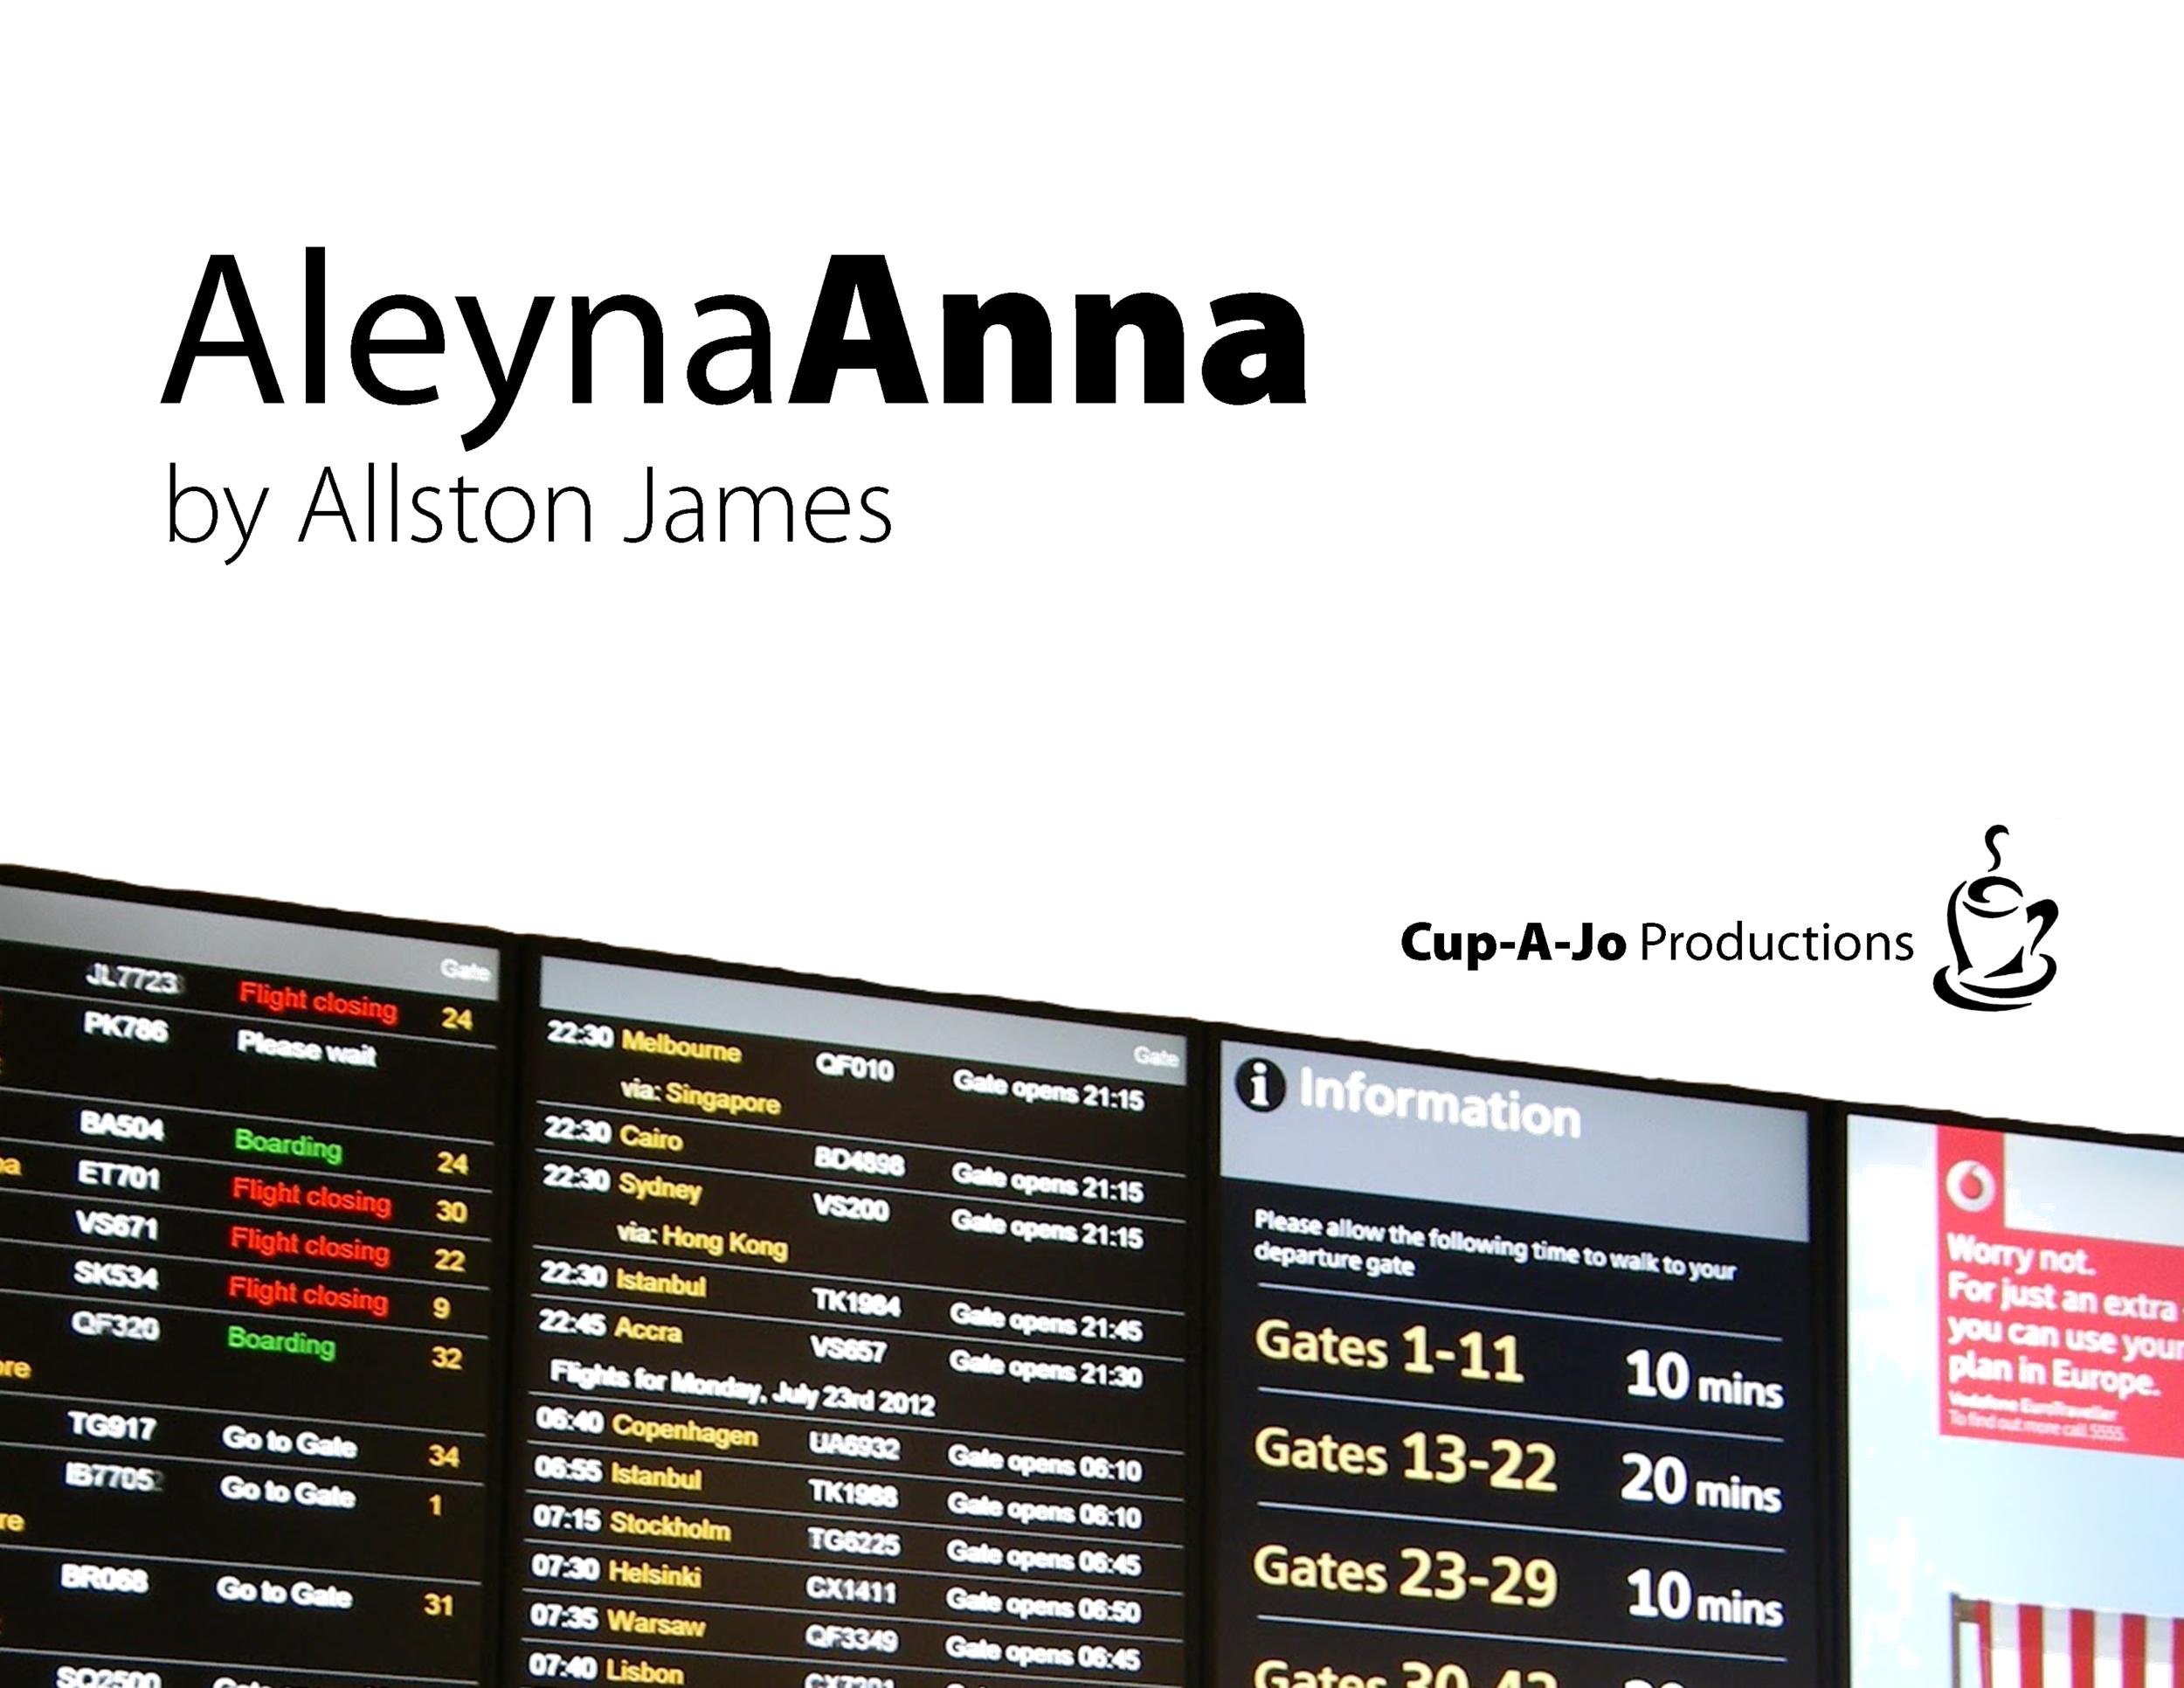 AleynaAnna Poster.png